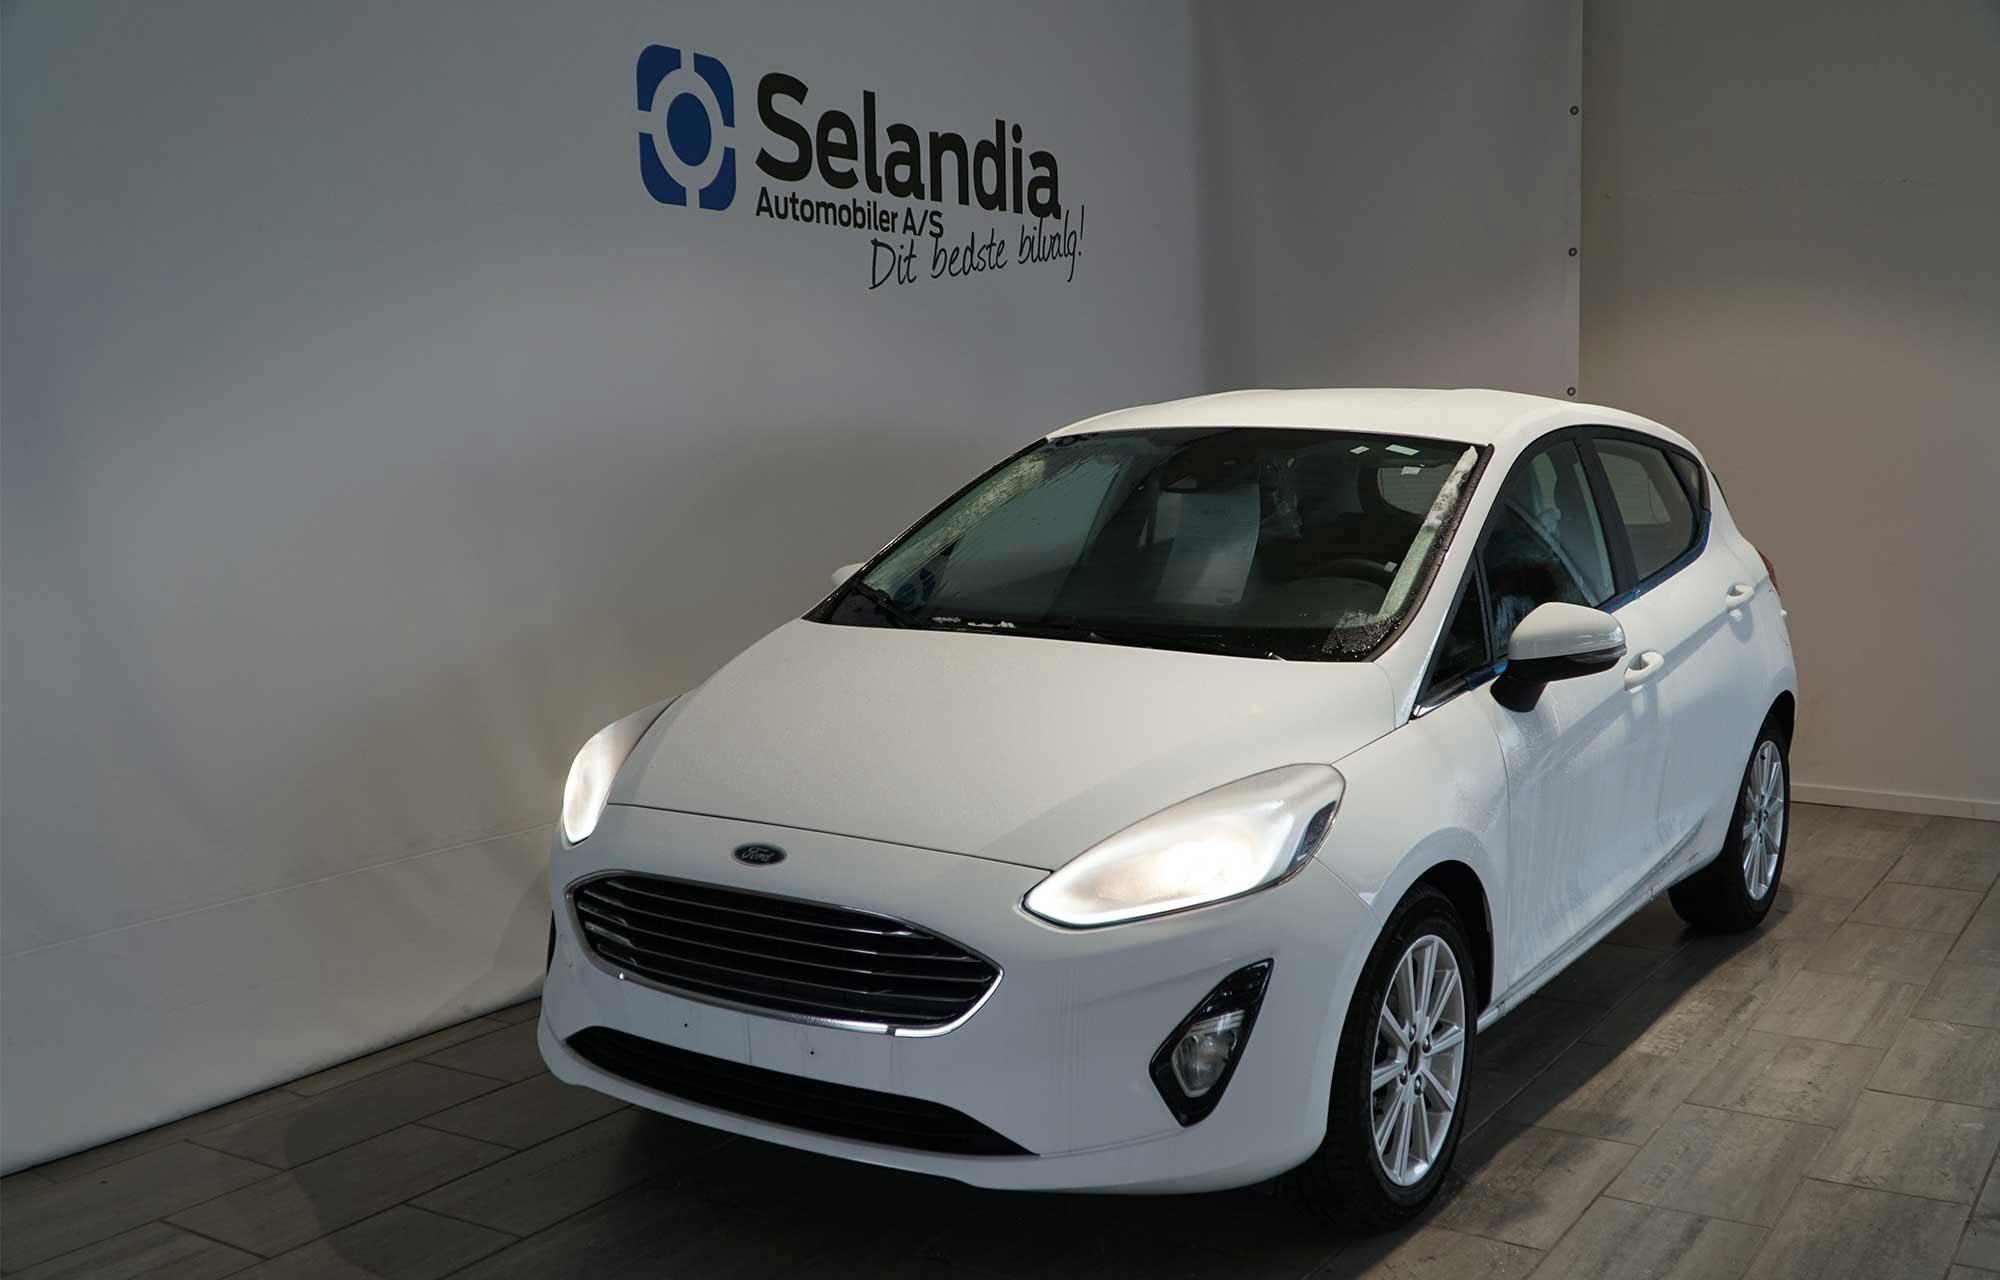 Ford Fiesta fra Danmarks første bilwebshop